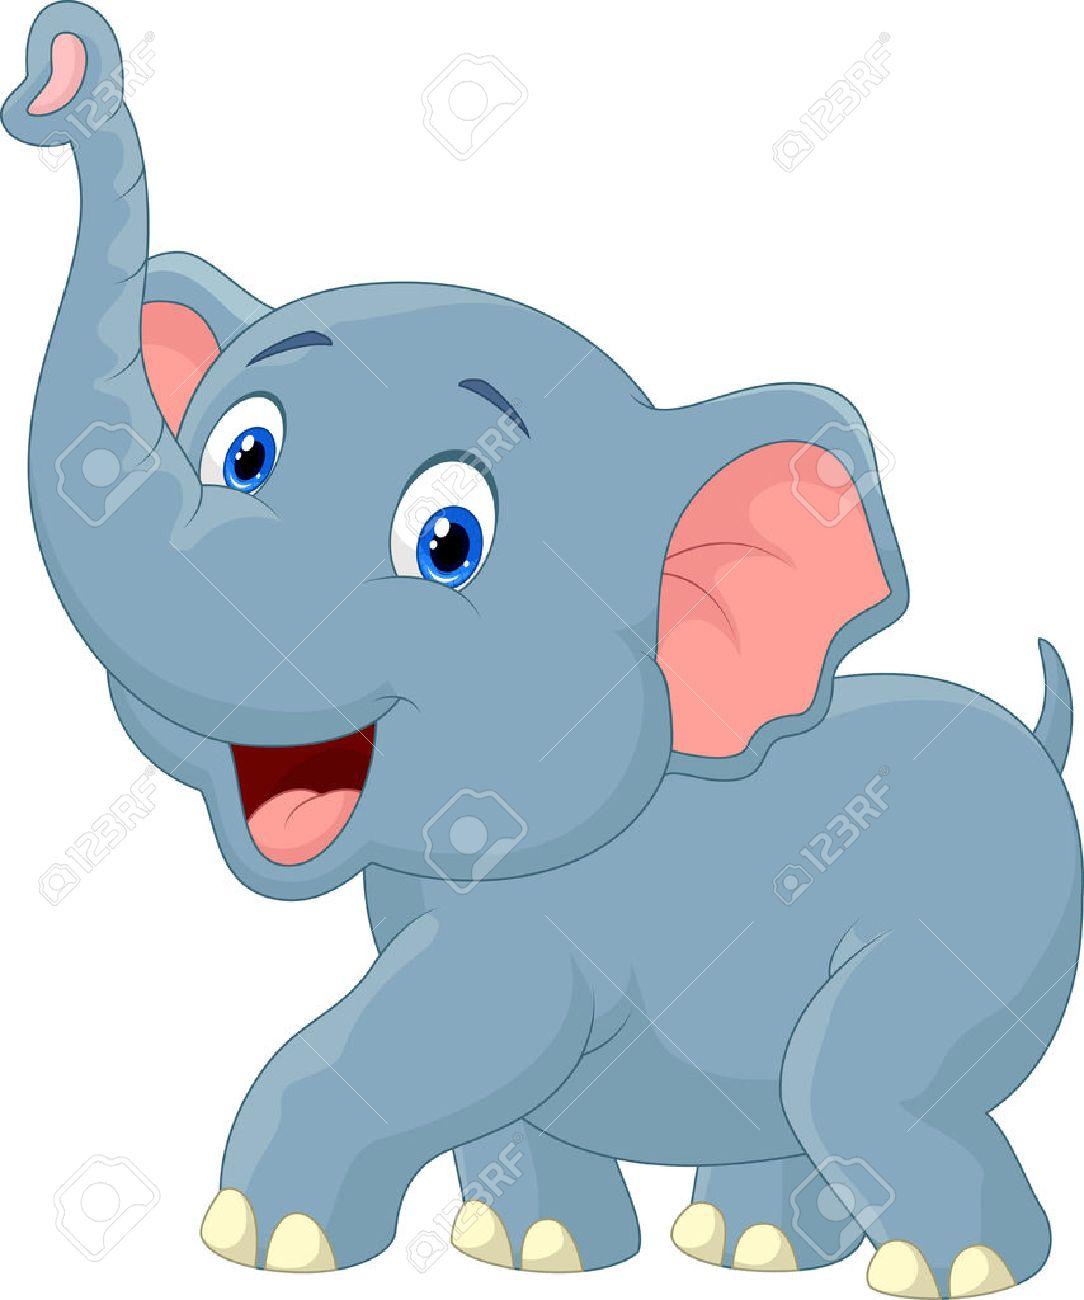 elephant cartoon stock photos royalty free elephant cartoon images rh 123rf com elephant cartoon images free elephant cartoon pictures print